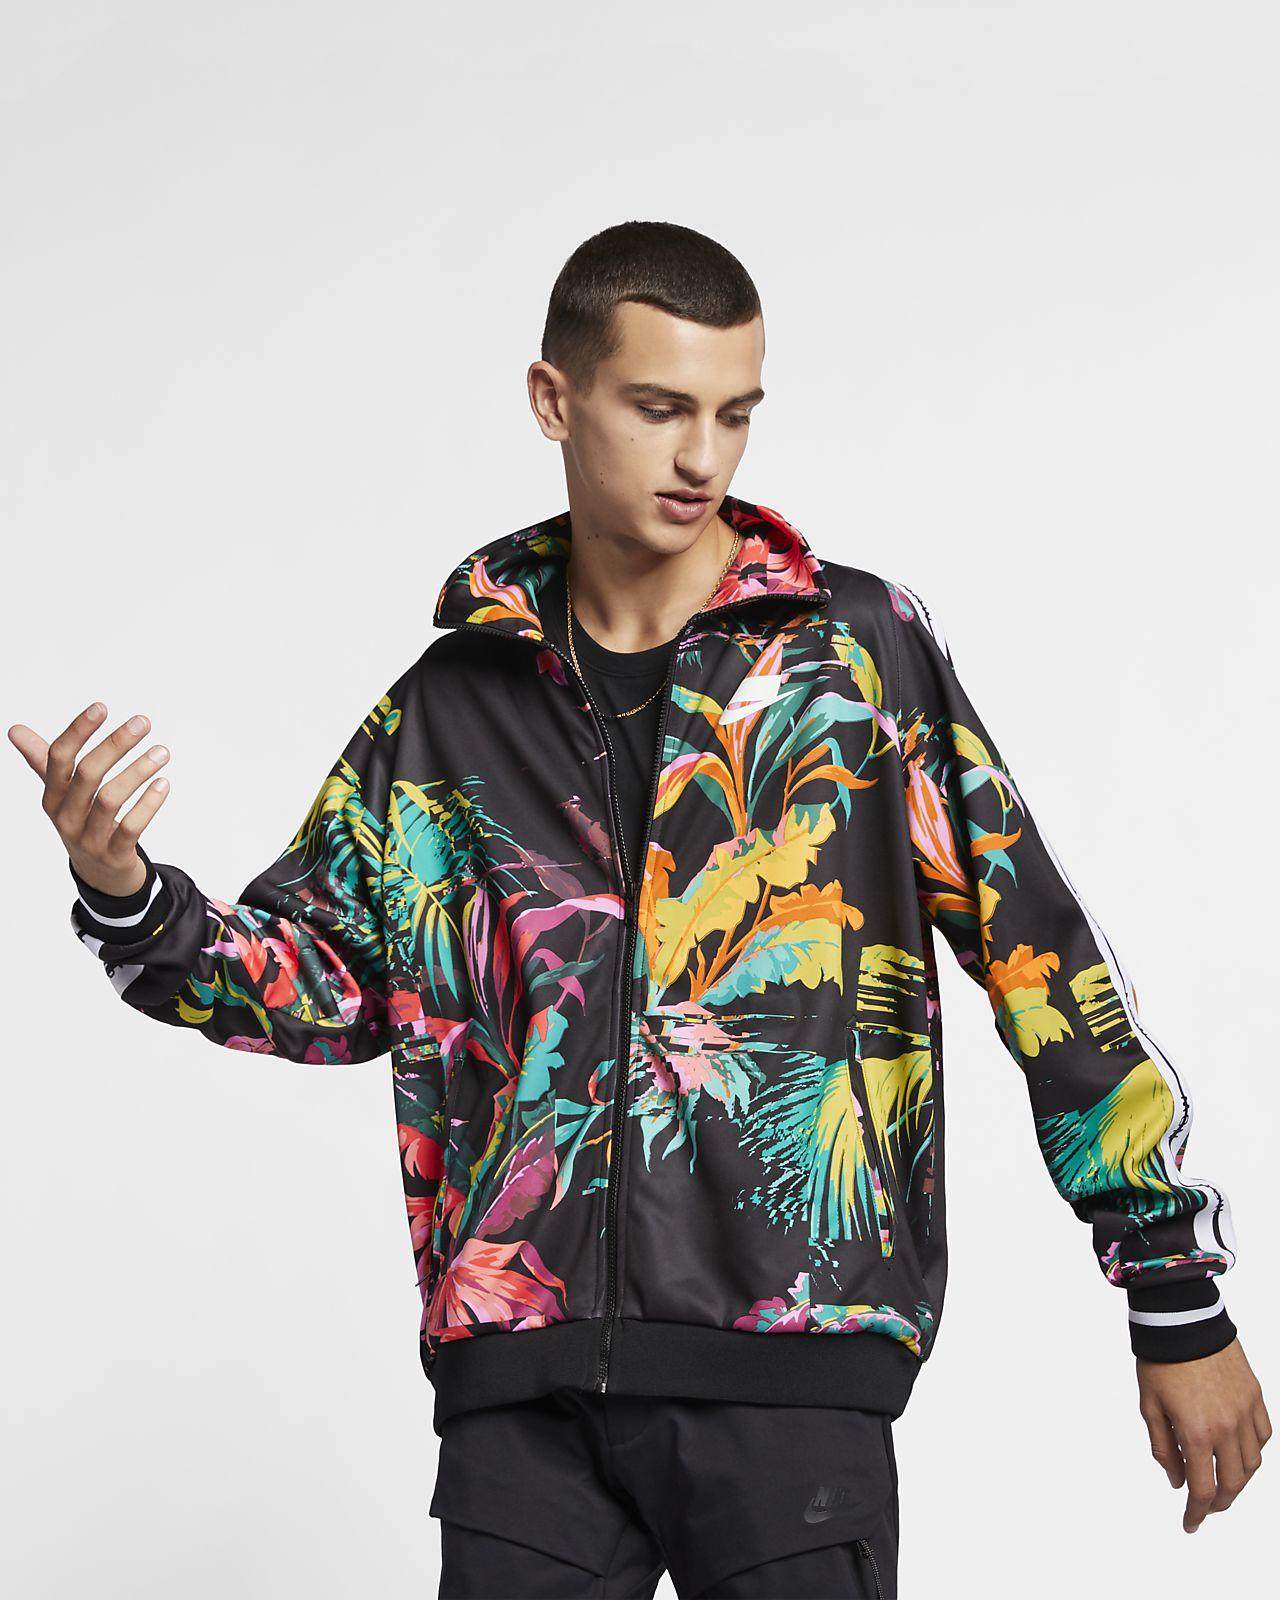 Sportswear Con Palm Colletto Risvolto Track Nsw Nike Jacket n1XxBqXc8U a409b10a50e